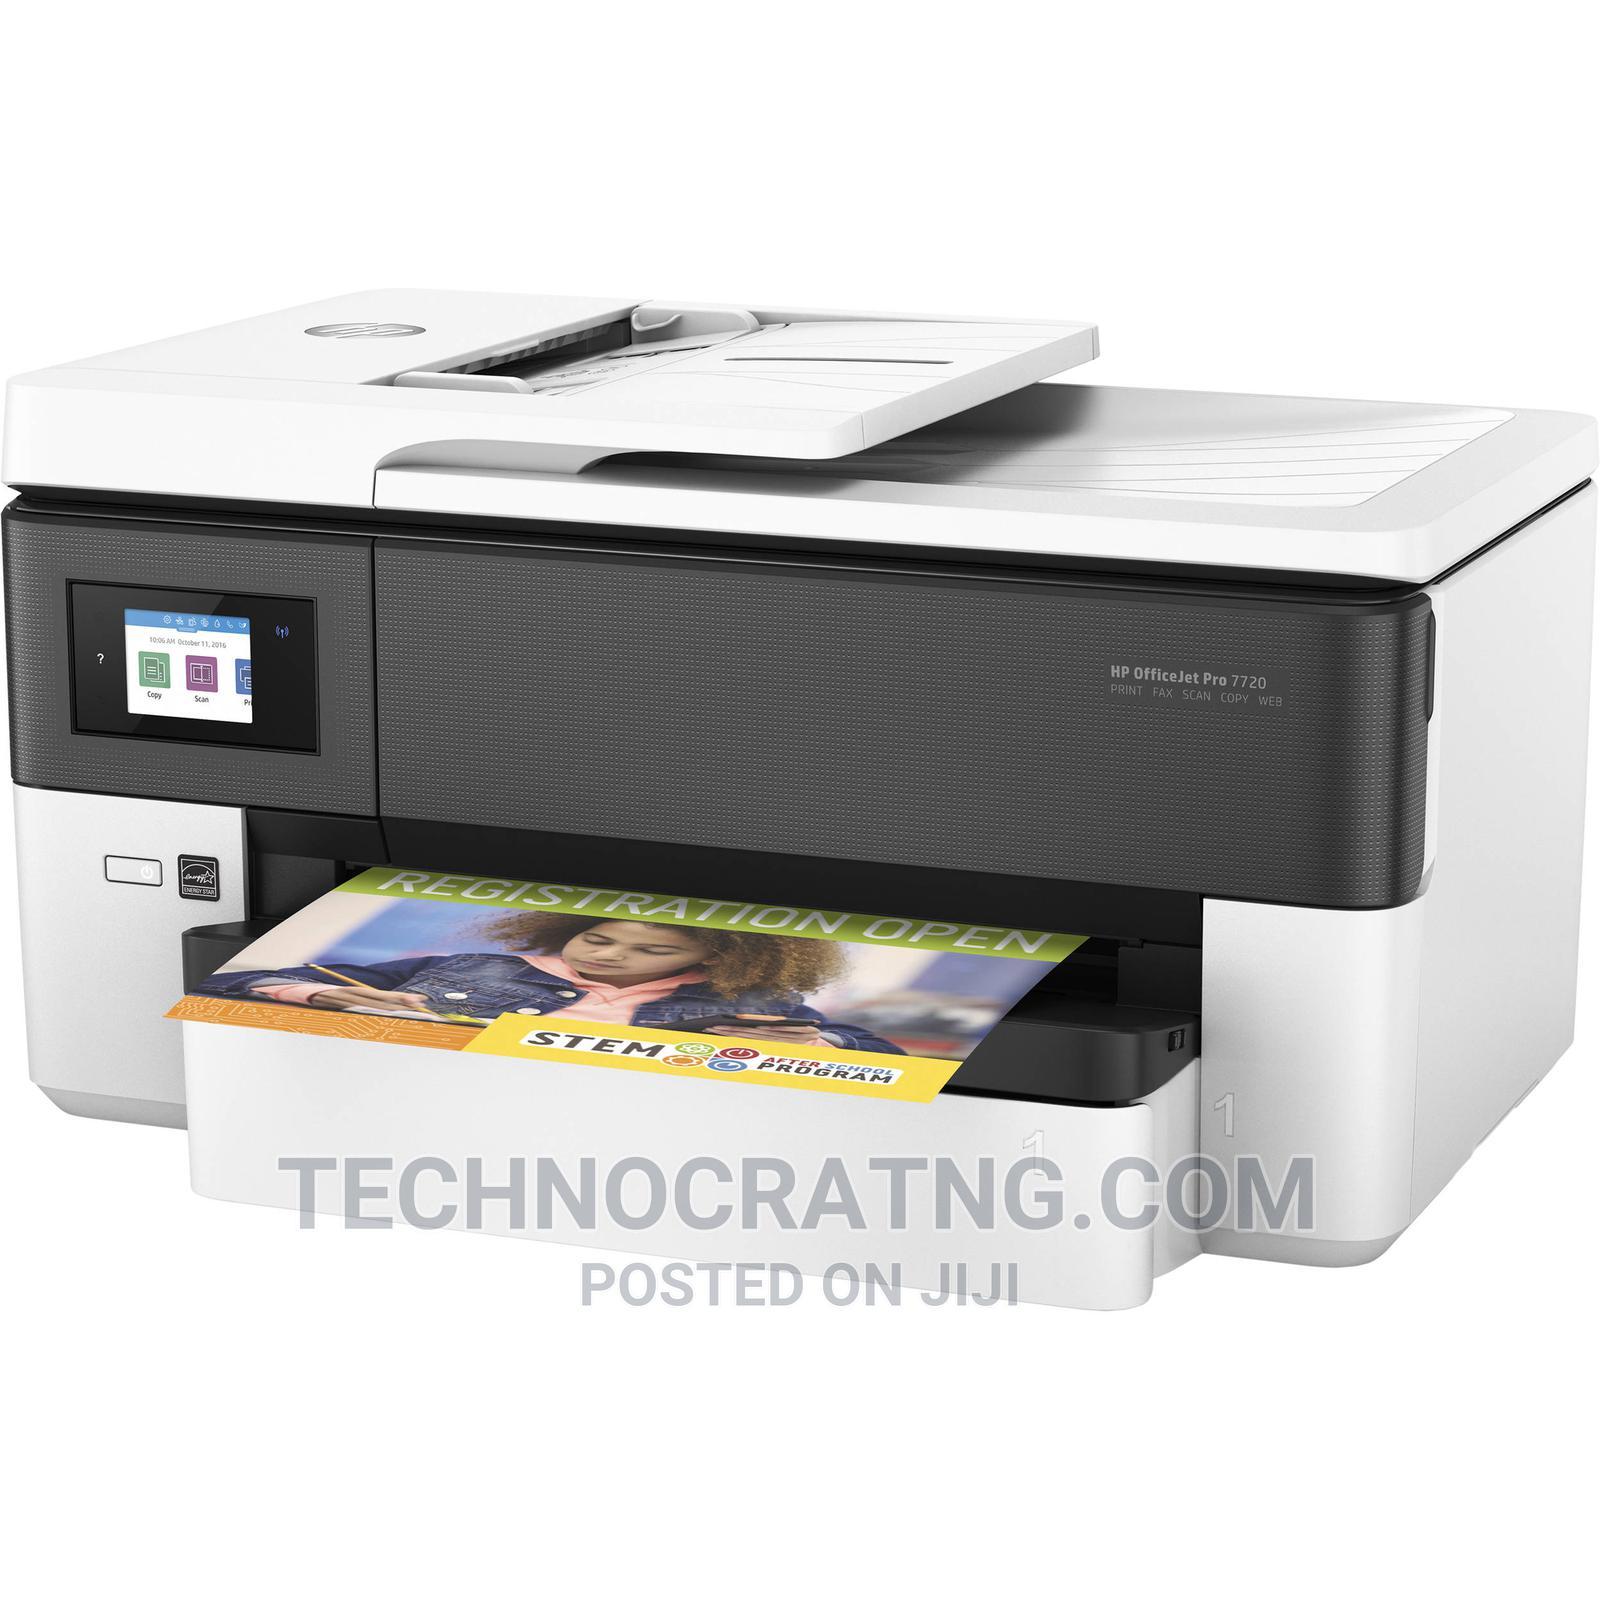 HP Officejet PRO 7720 Wide Format AIO Printer